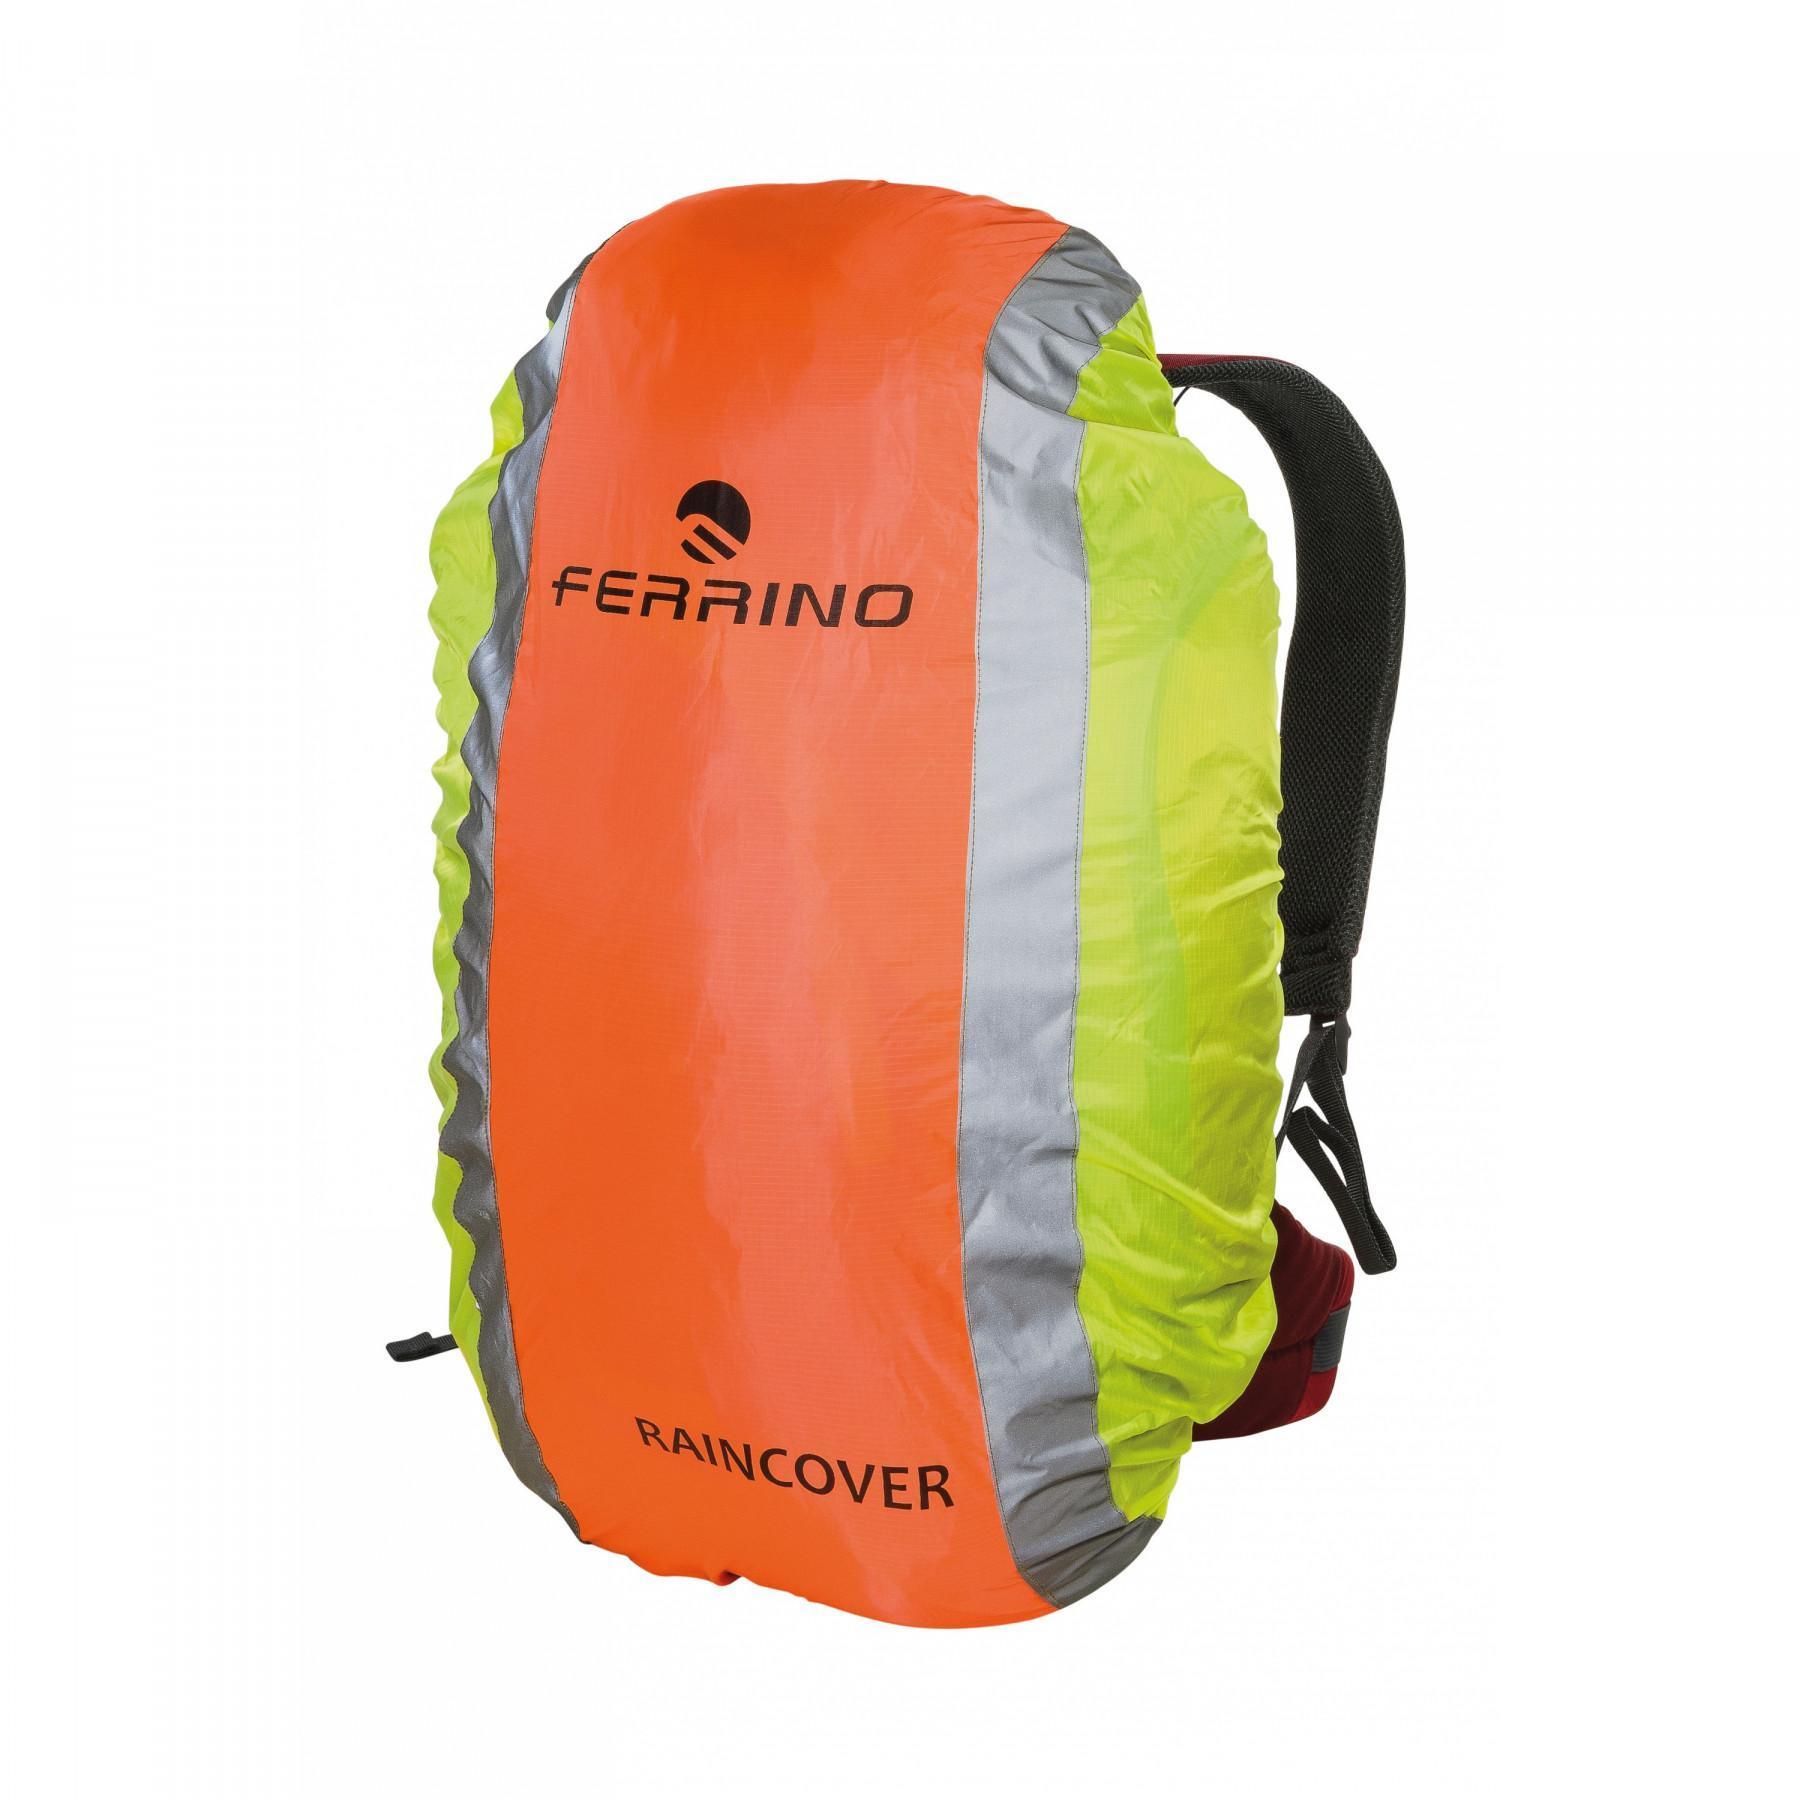 Sursac Ferrino cover 0 reflex